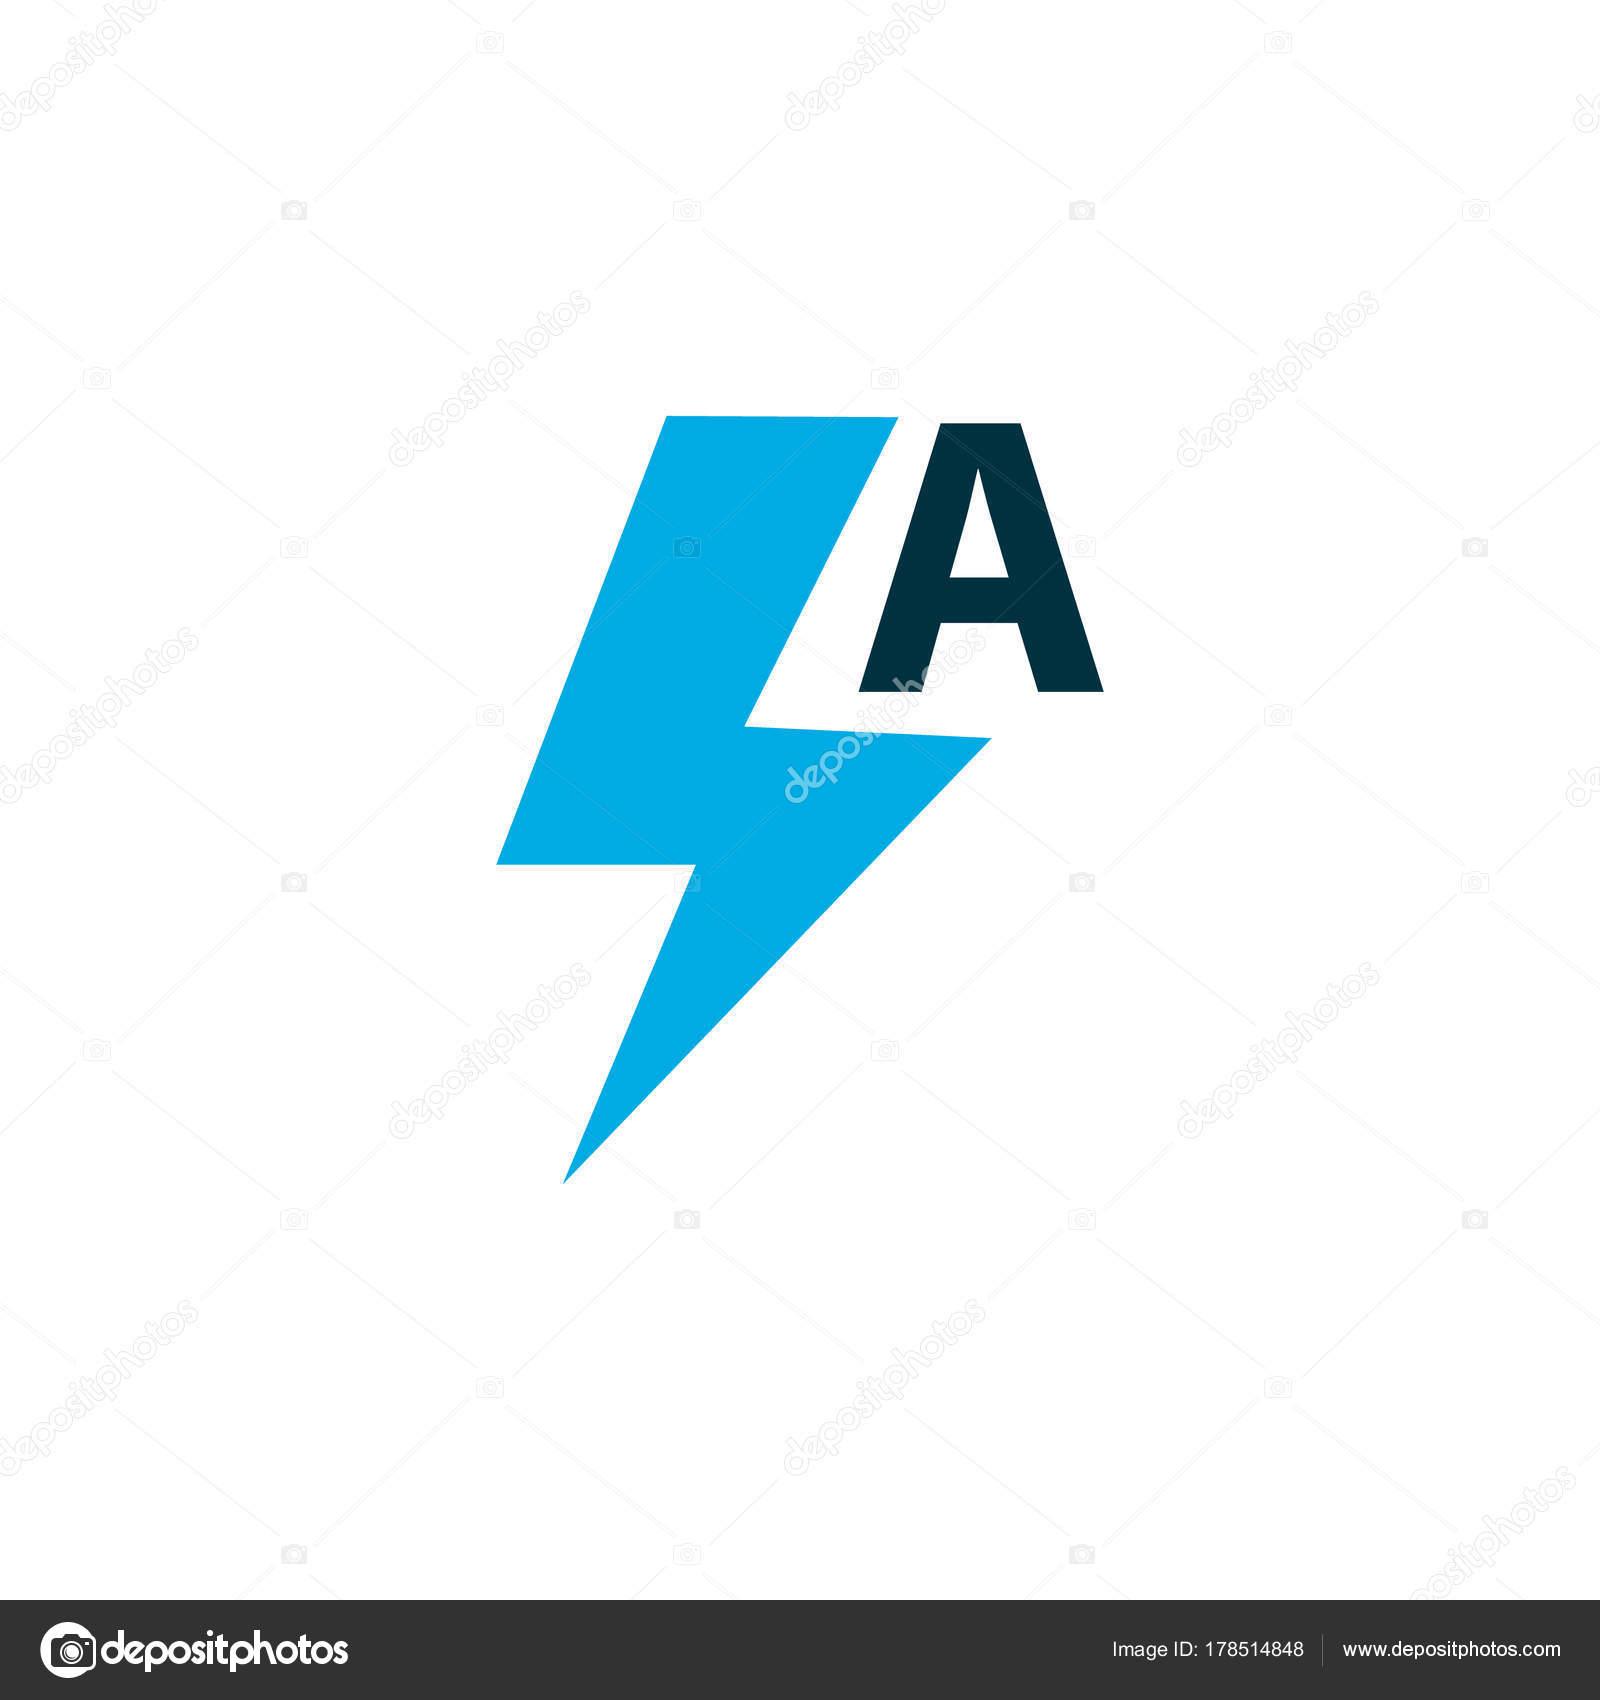 Automatische Symbol farbiges Symbol. Premium-Qualität isoliert ...